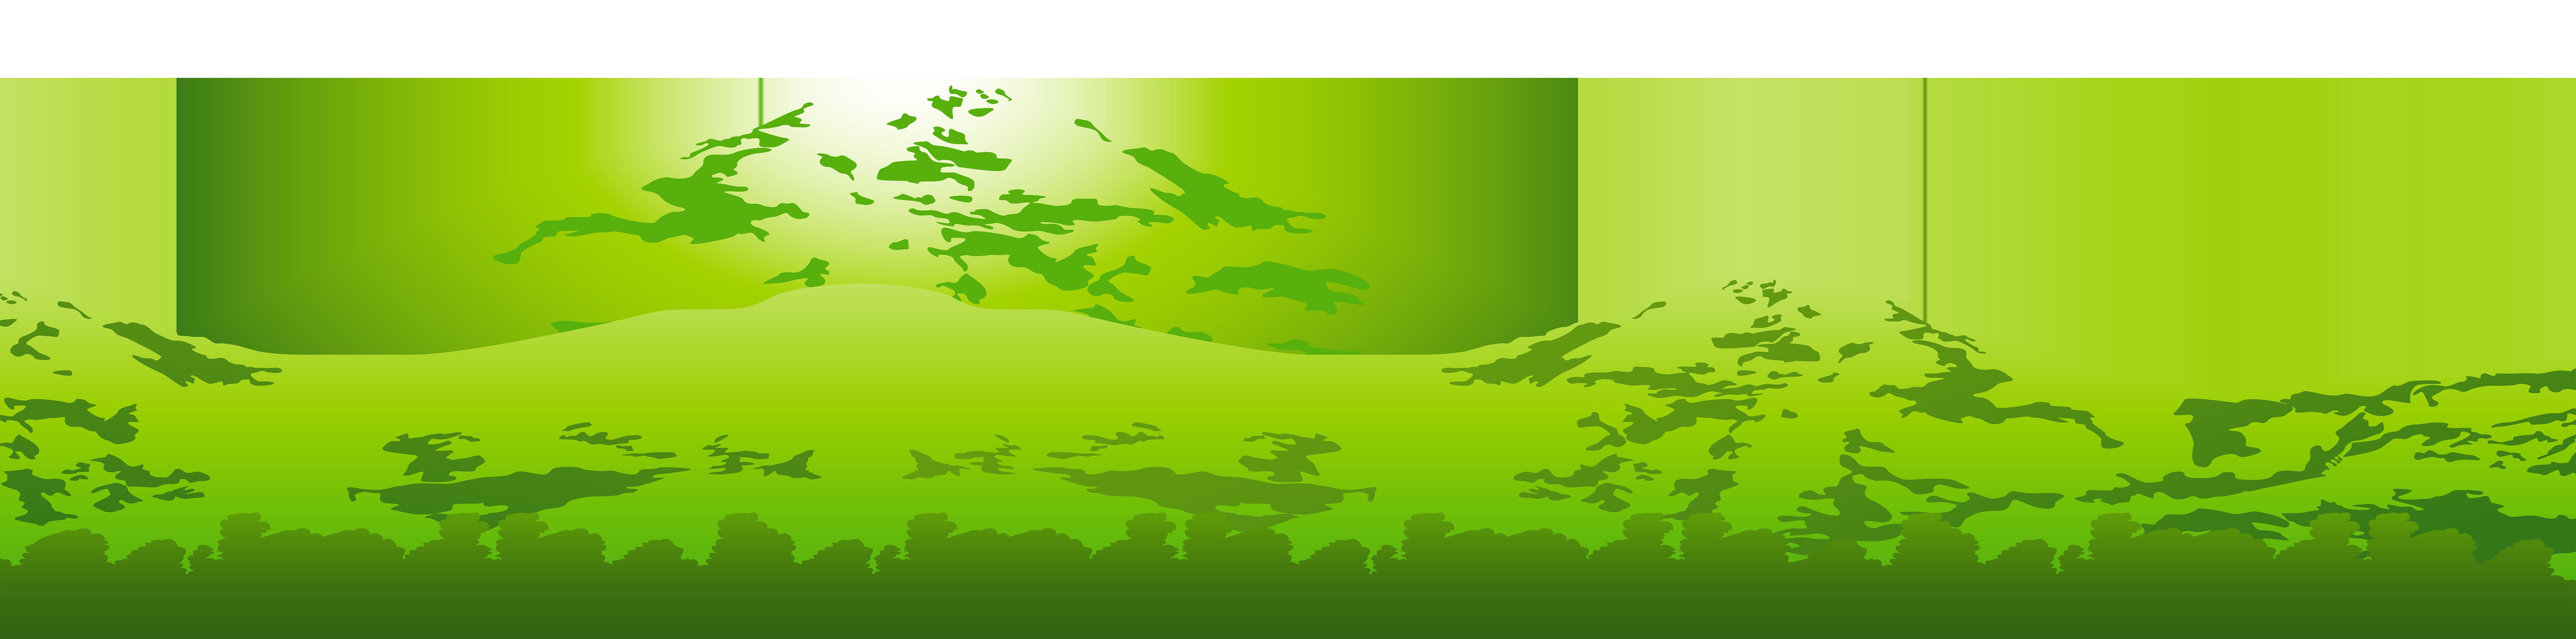 Tree mountain clipart clip transparent stock Green Mountain Transparent PNG Clip Art Image | Gallery ... clip transparent stock